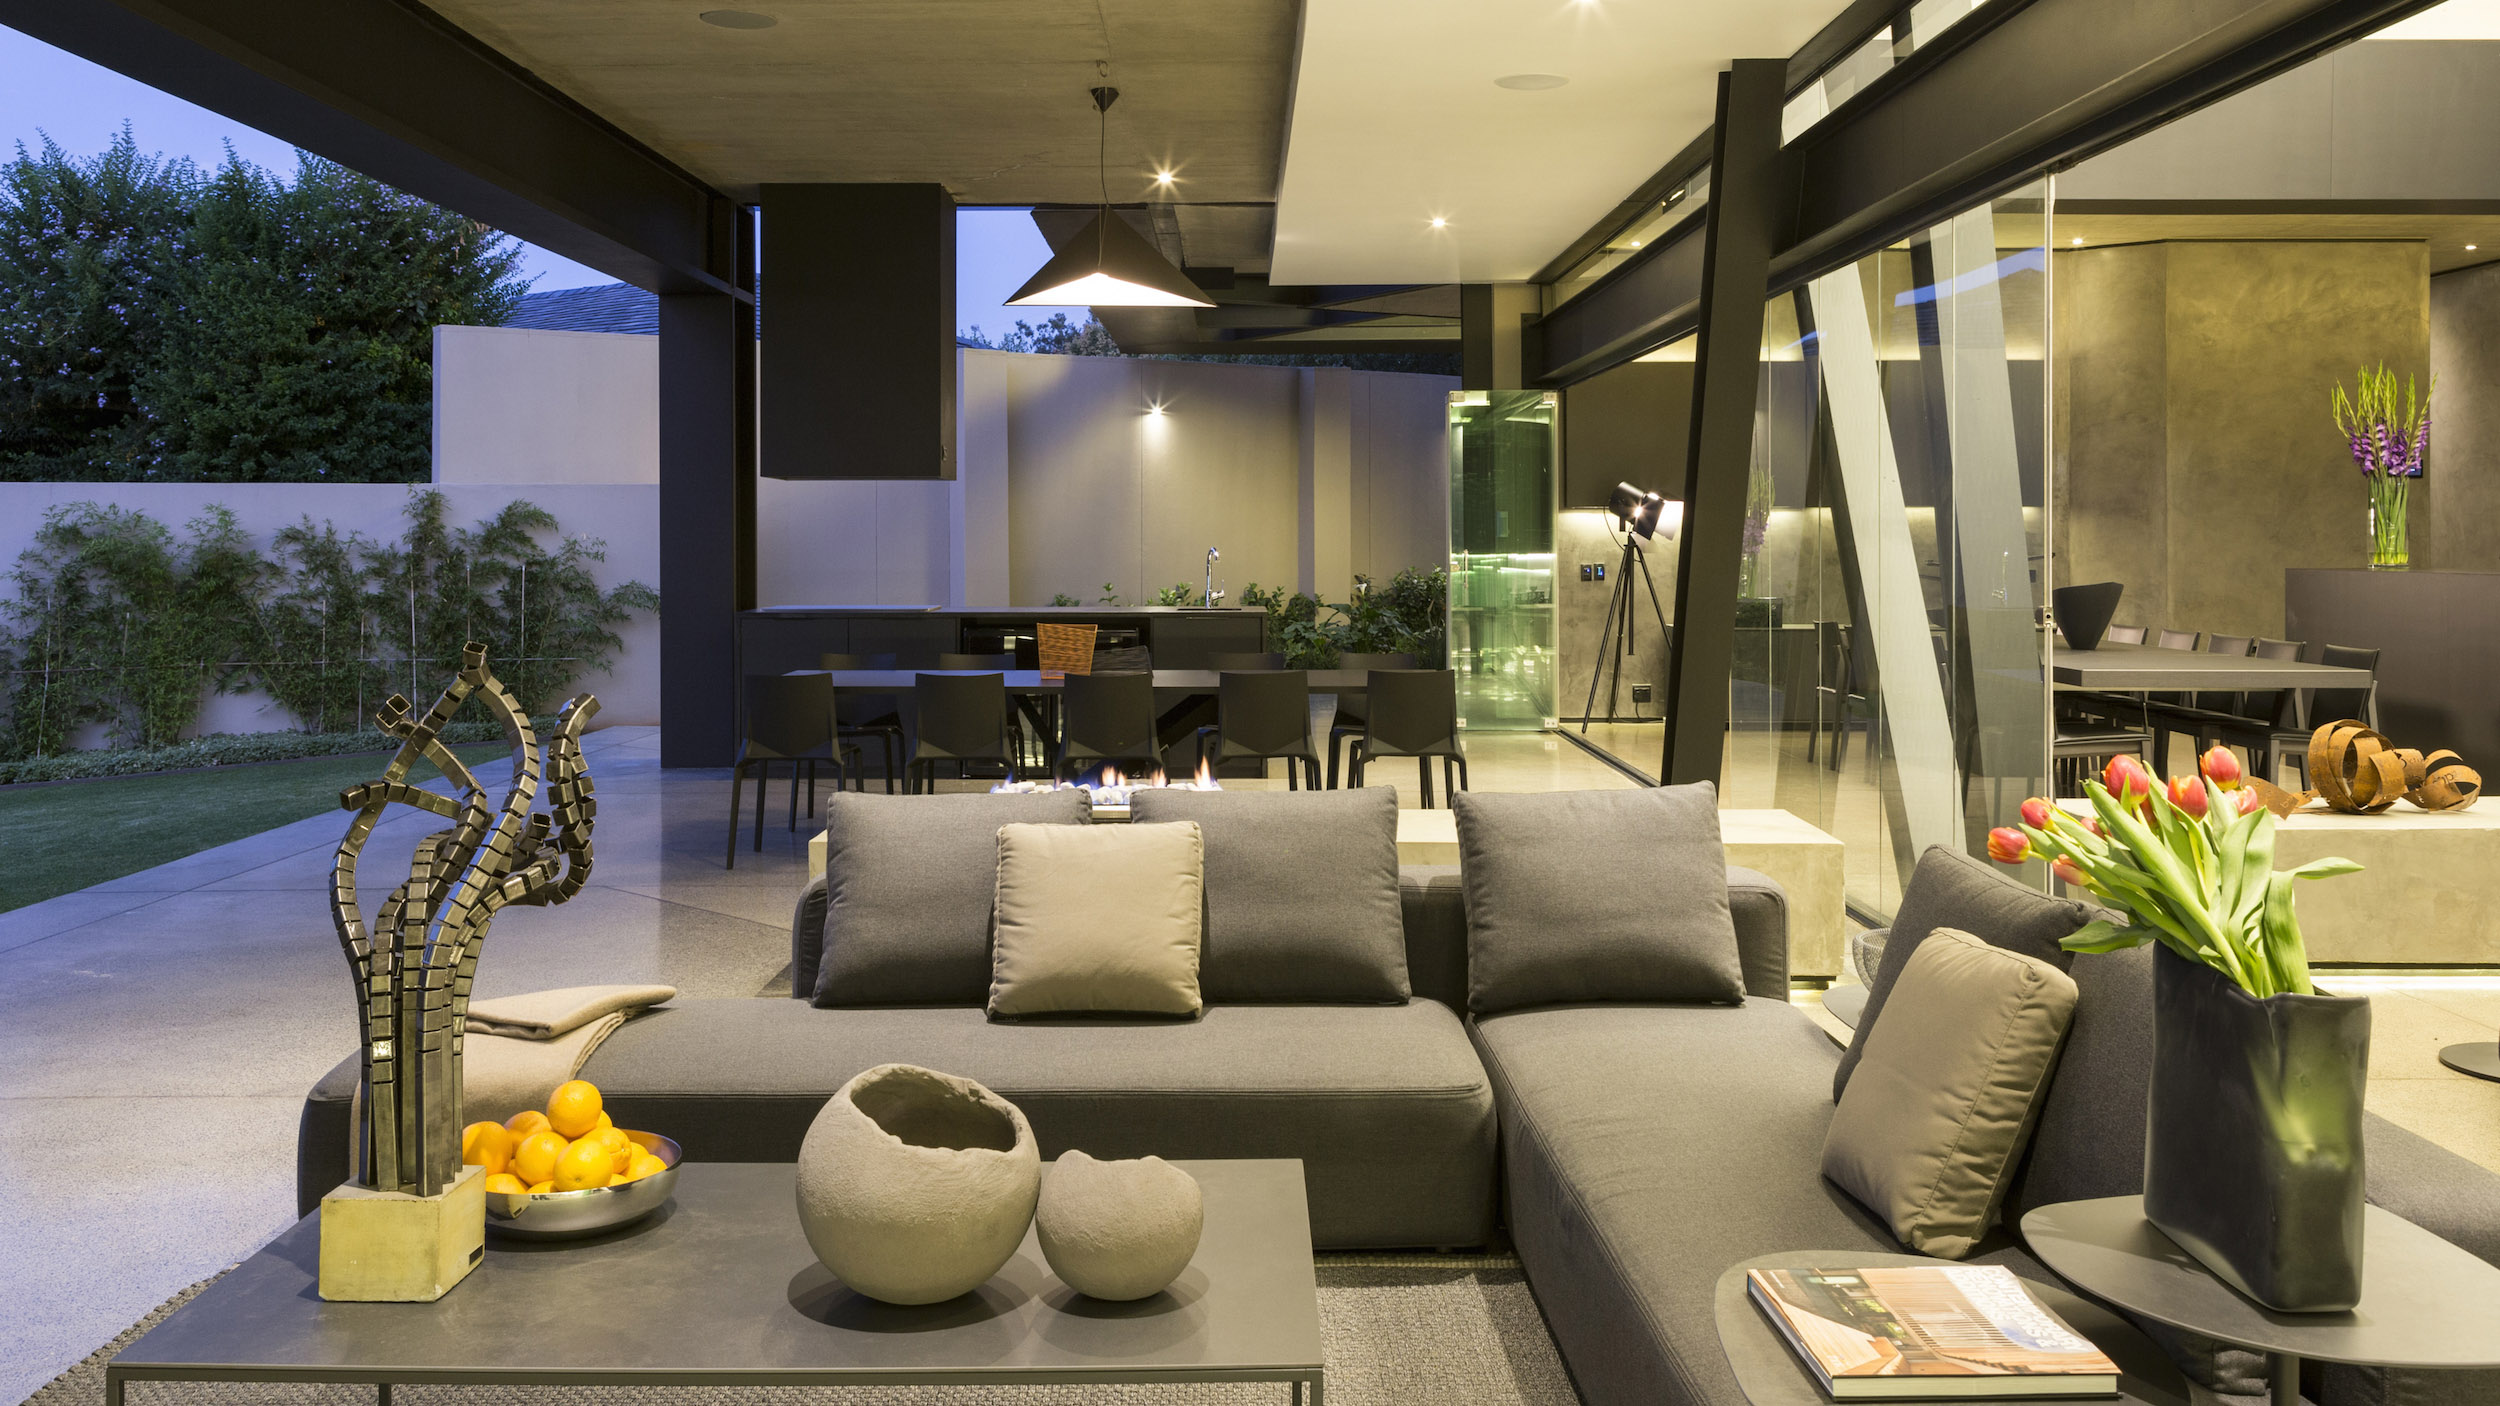 Kloof Road Masterpiece House in Johannesburg by Nico van der Meulen Architects-25